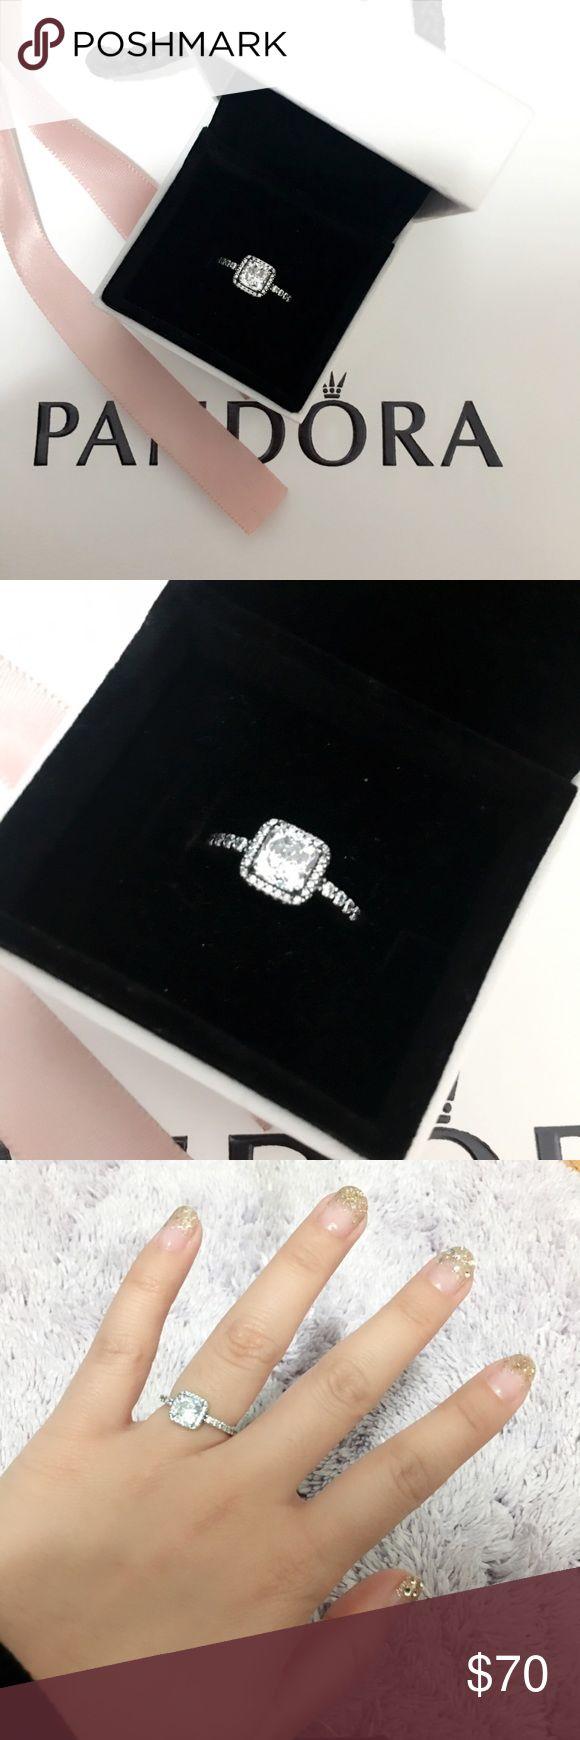 Pandora  Timeless Elegance Ring New never worn Pandora Jewelry Rings